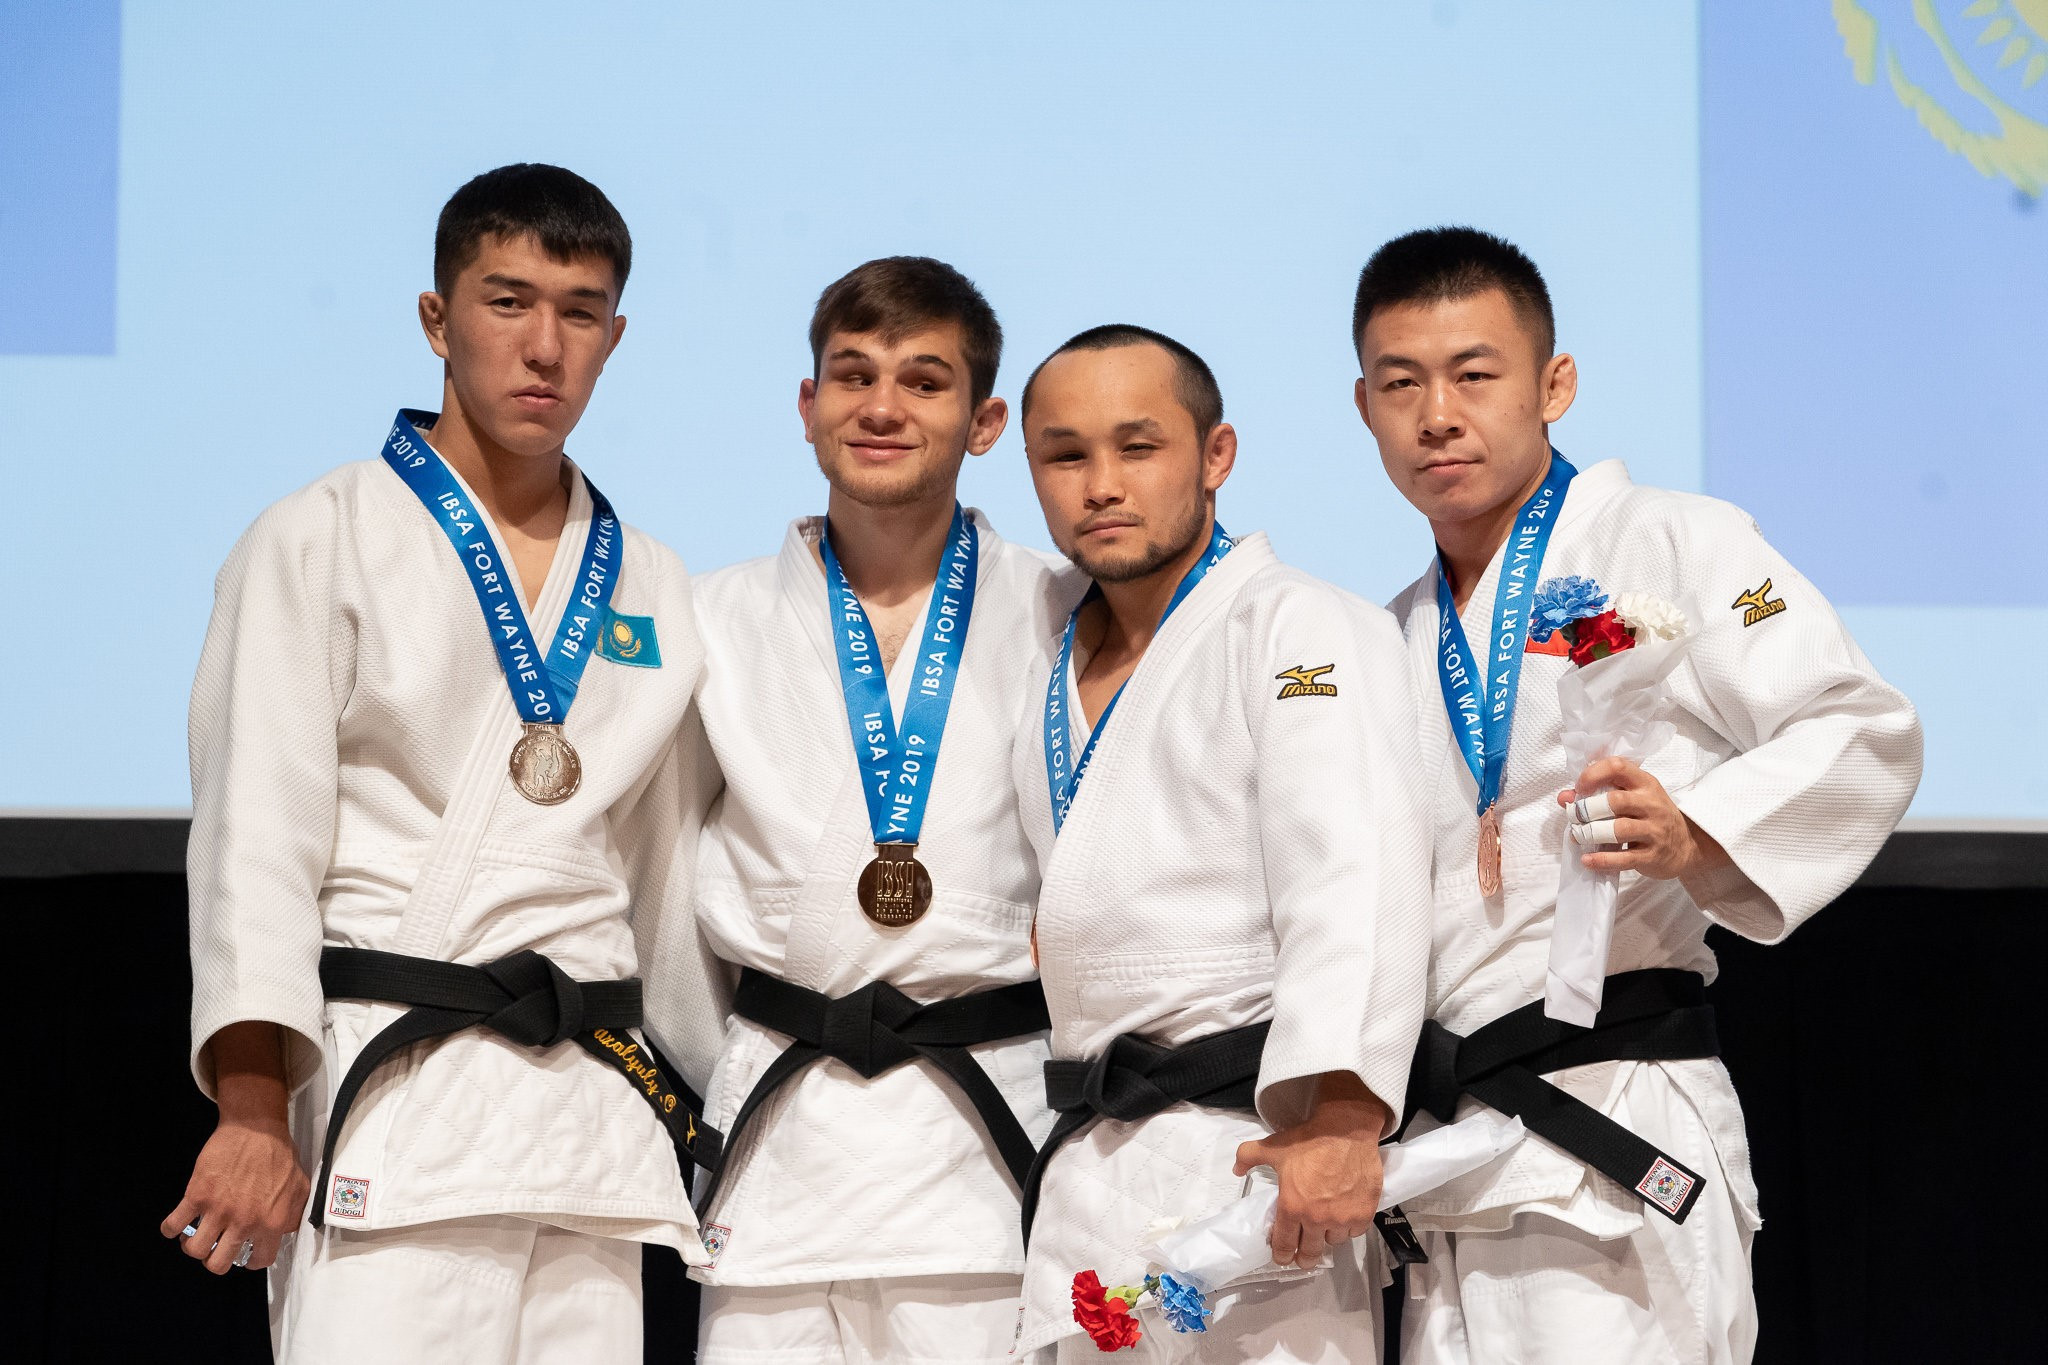 Romania's Bologa among winners as IBSA Judo International Qualifier for Tokyo 2020 begins